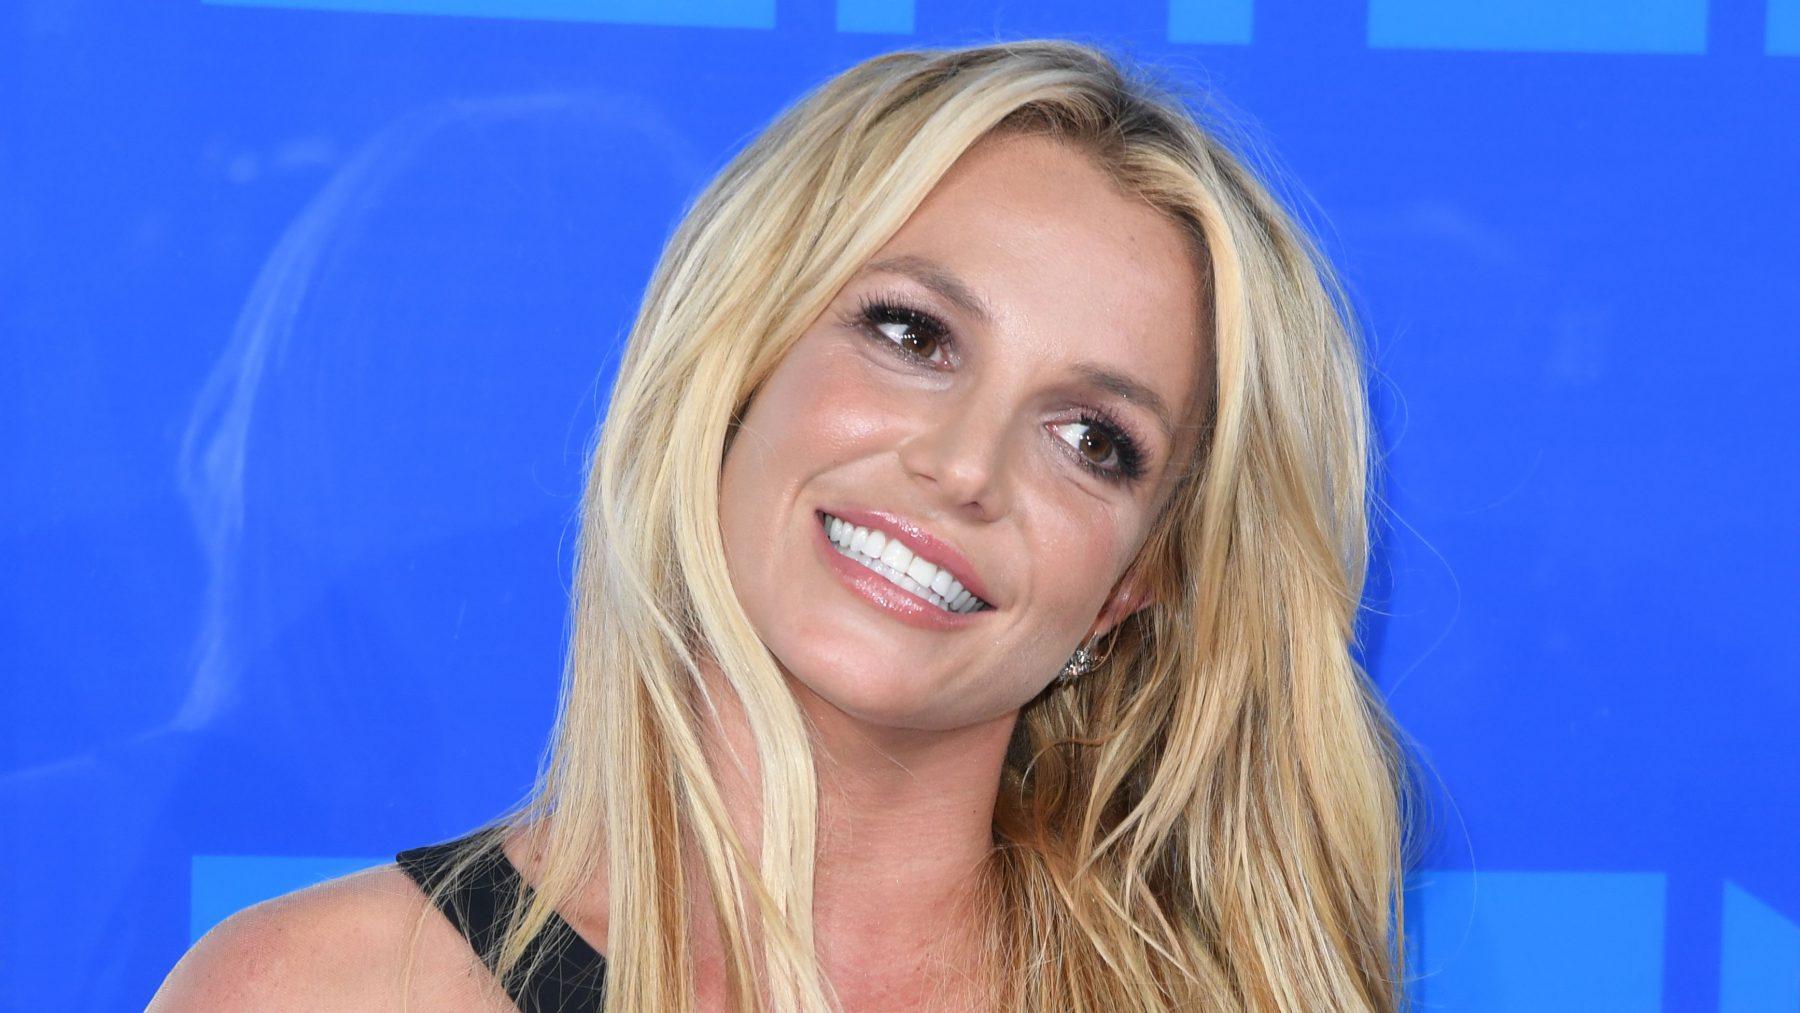 Britney tiktokt er lekker op los met nummer van ex Justin